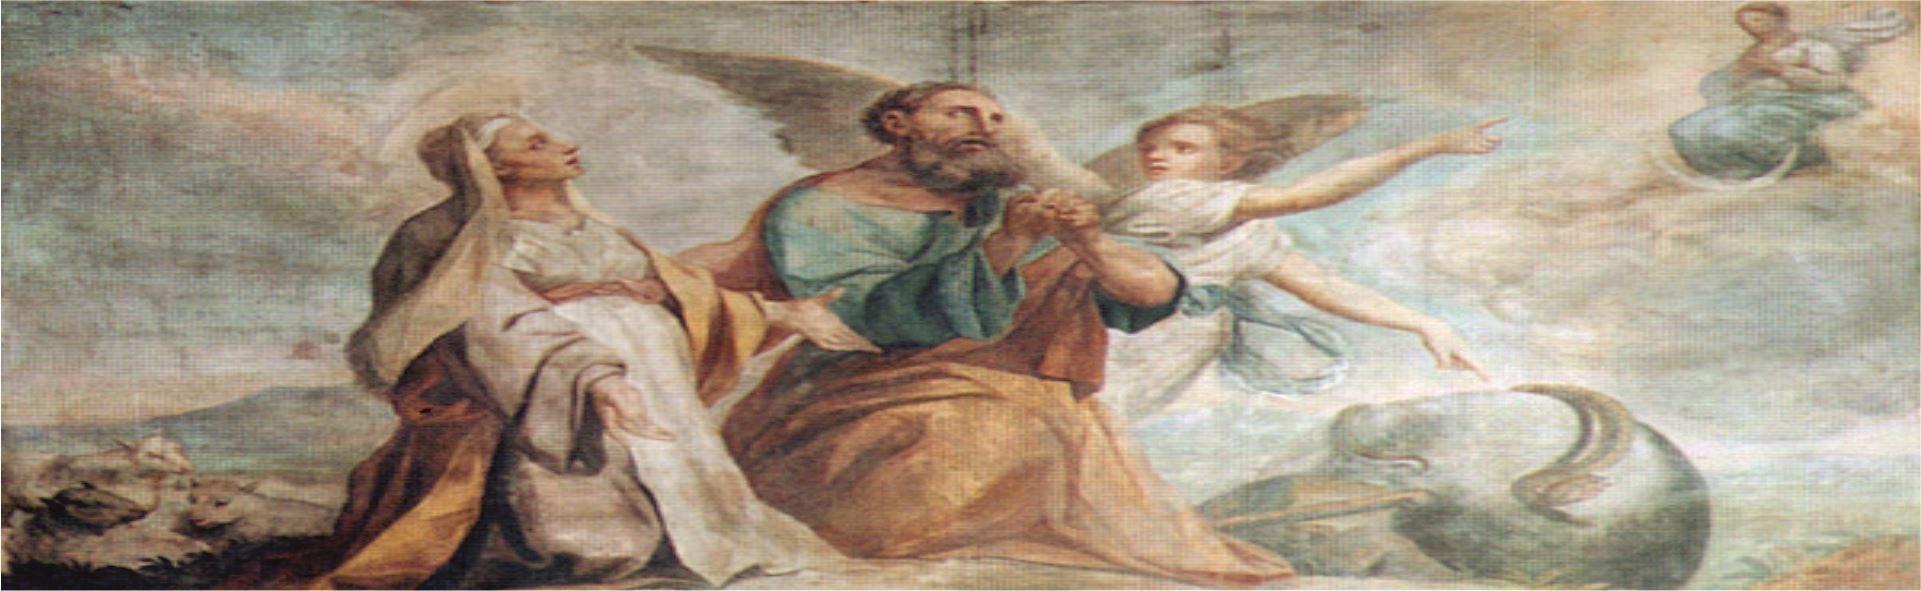 Nove Martedì e Novena a Sant'Anna - Santuario Sant'Anna - Caserta